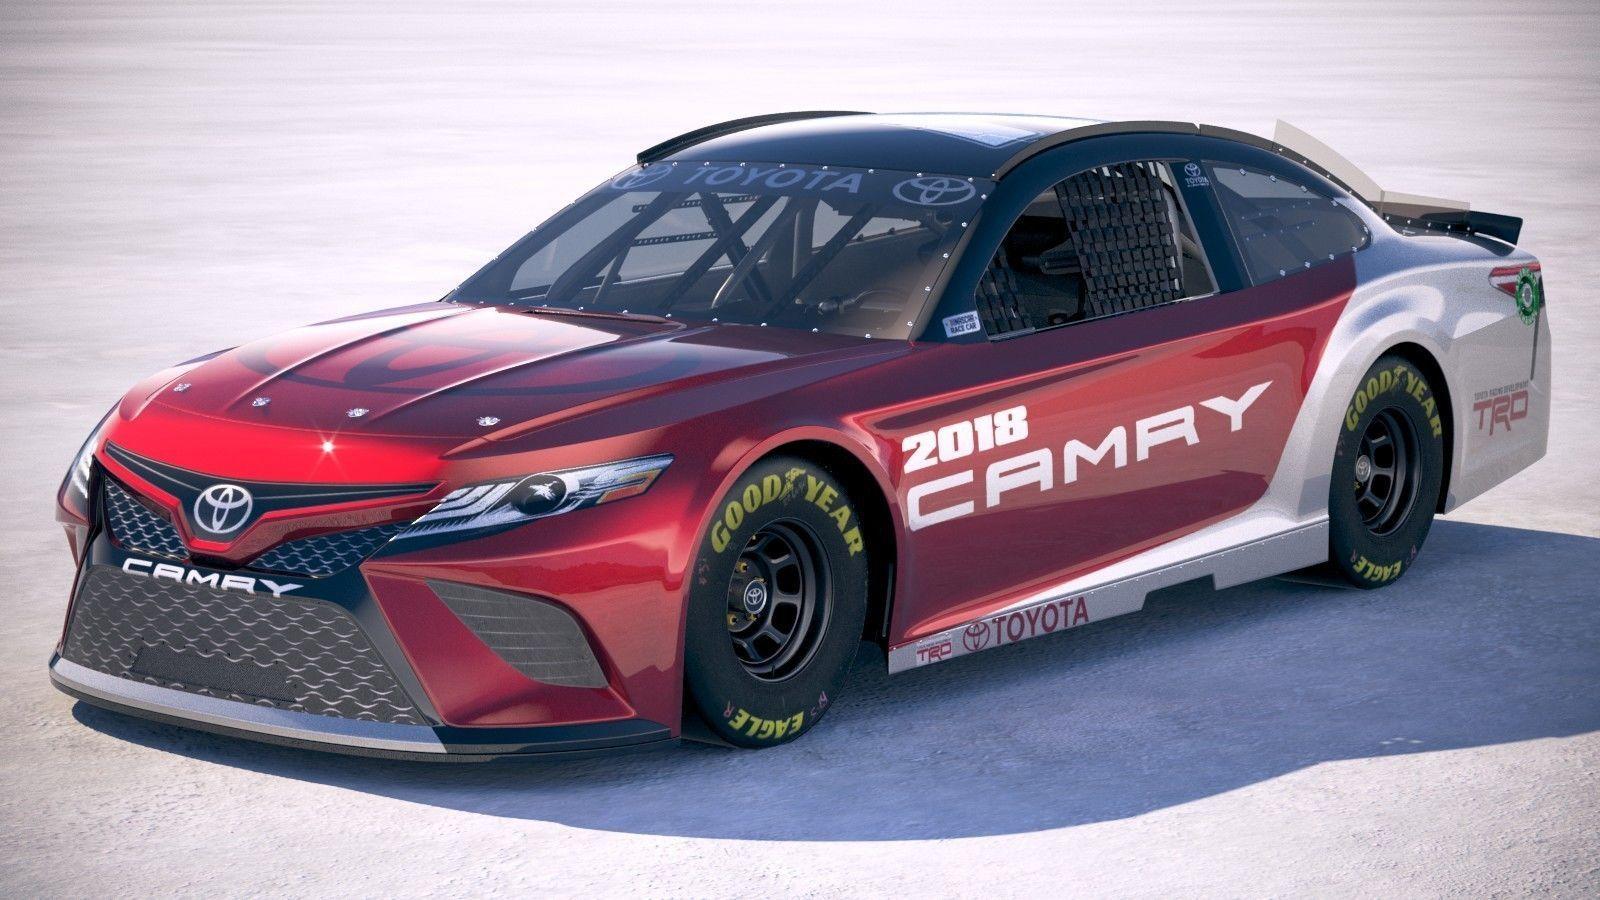 Toyota Camry Nascar 2018